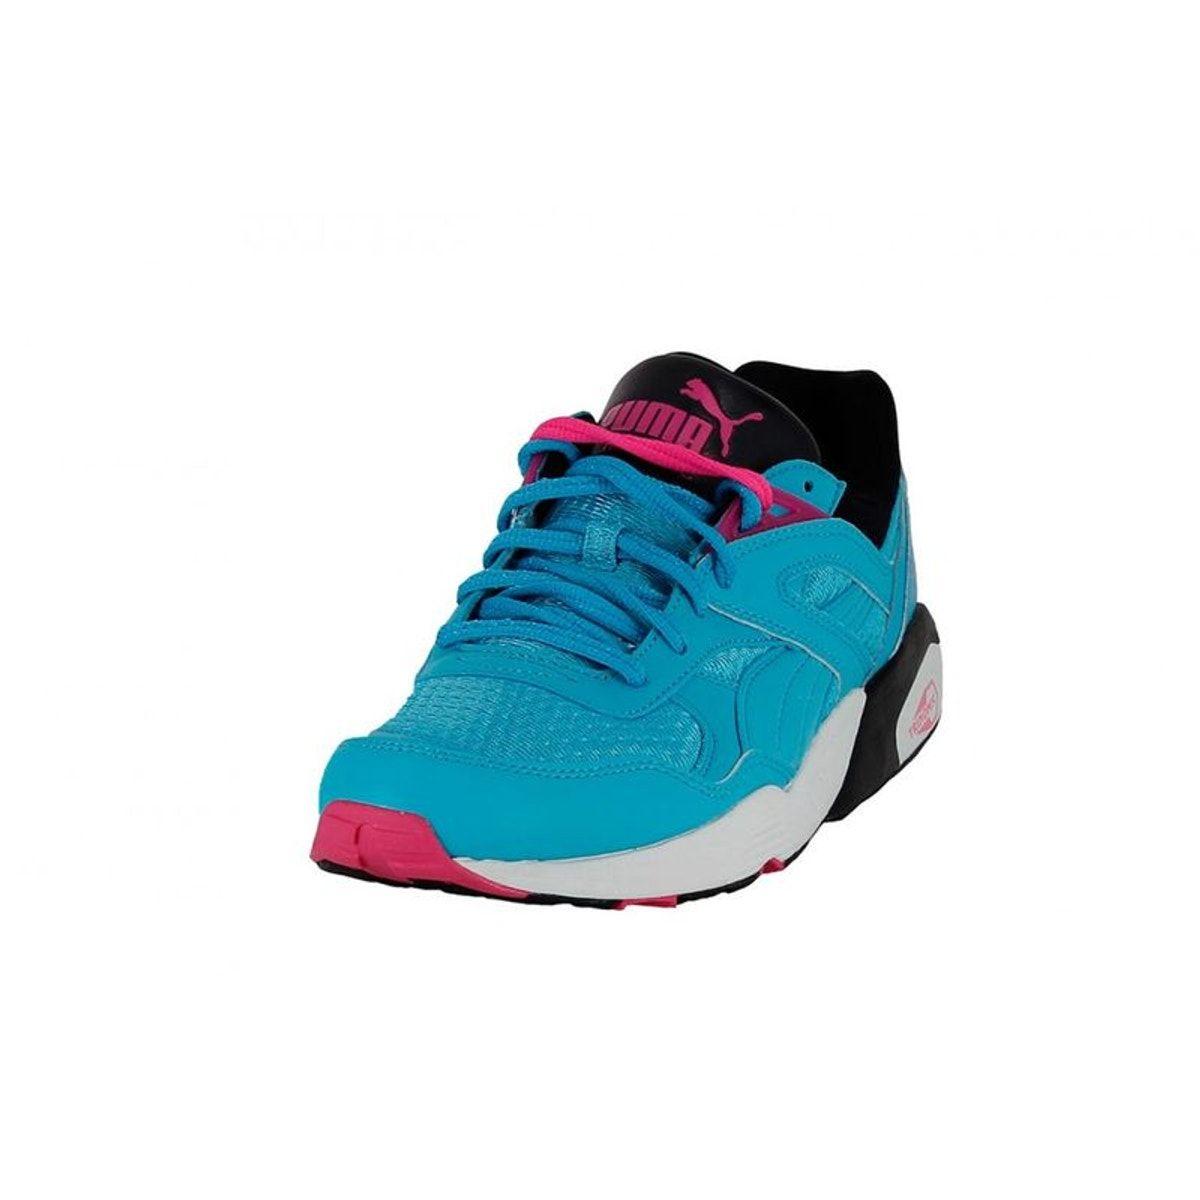 Femme PUMA Basket Puma Trinomic R698 Sport 357331 03 Bleu